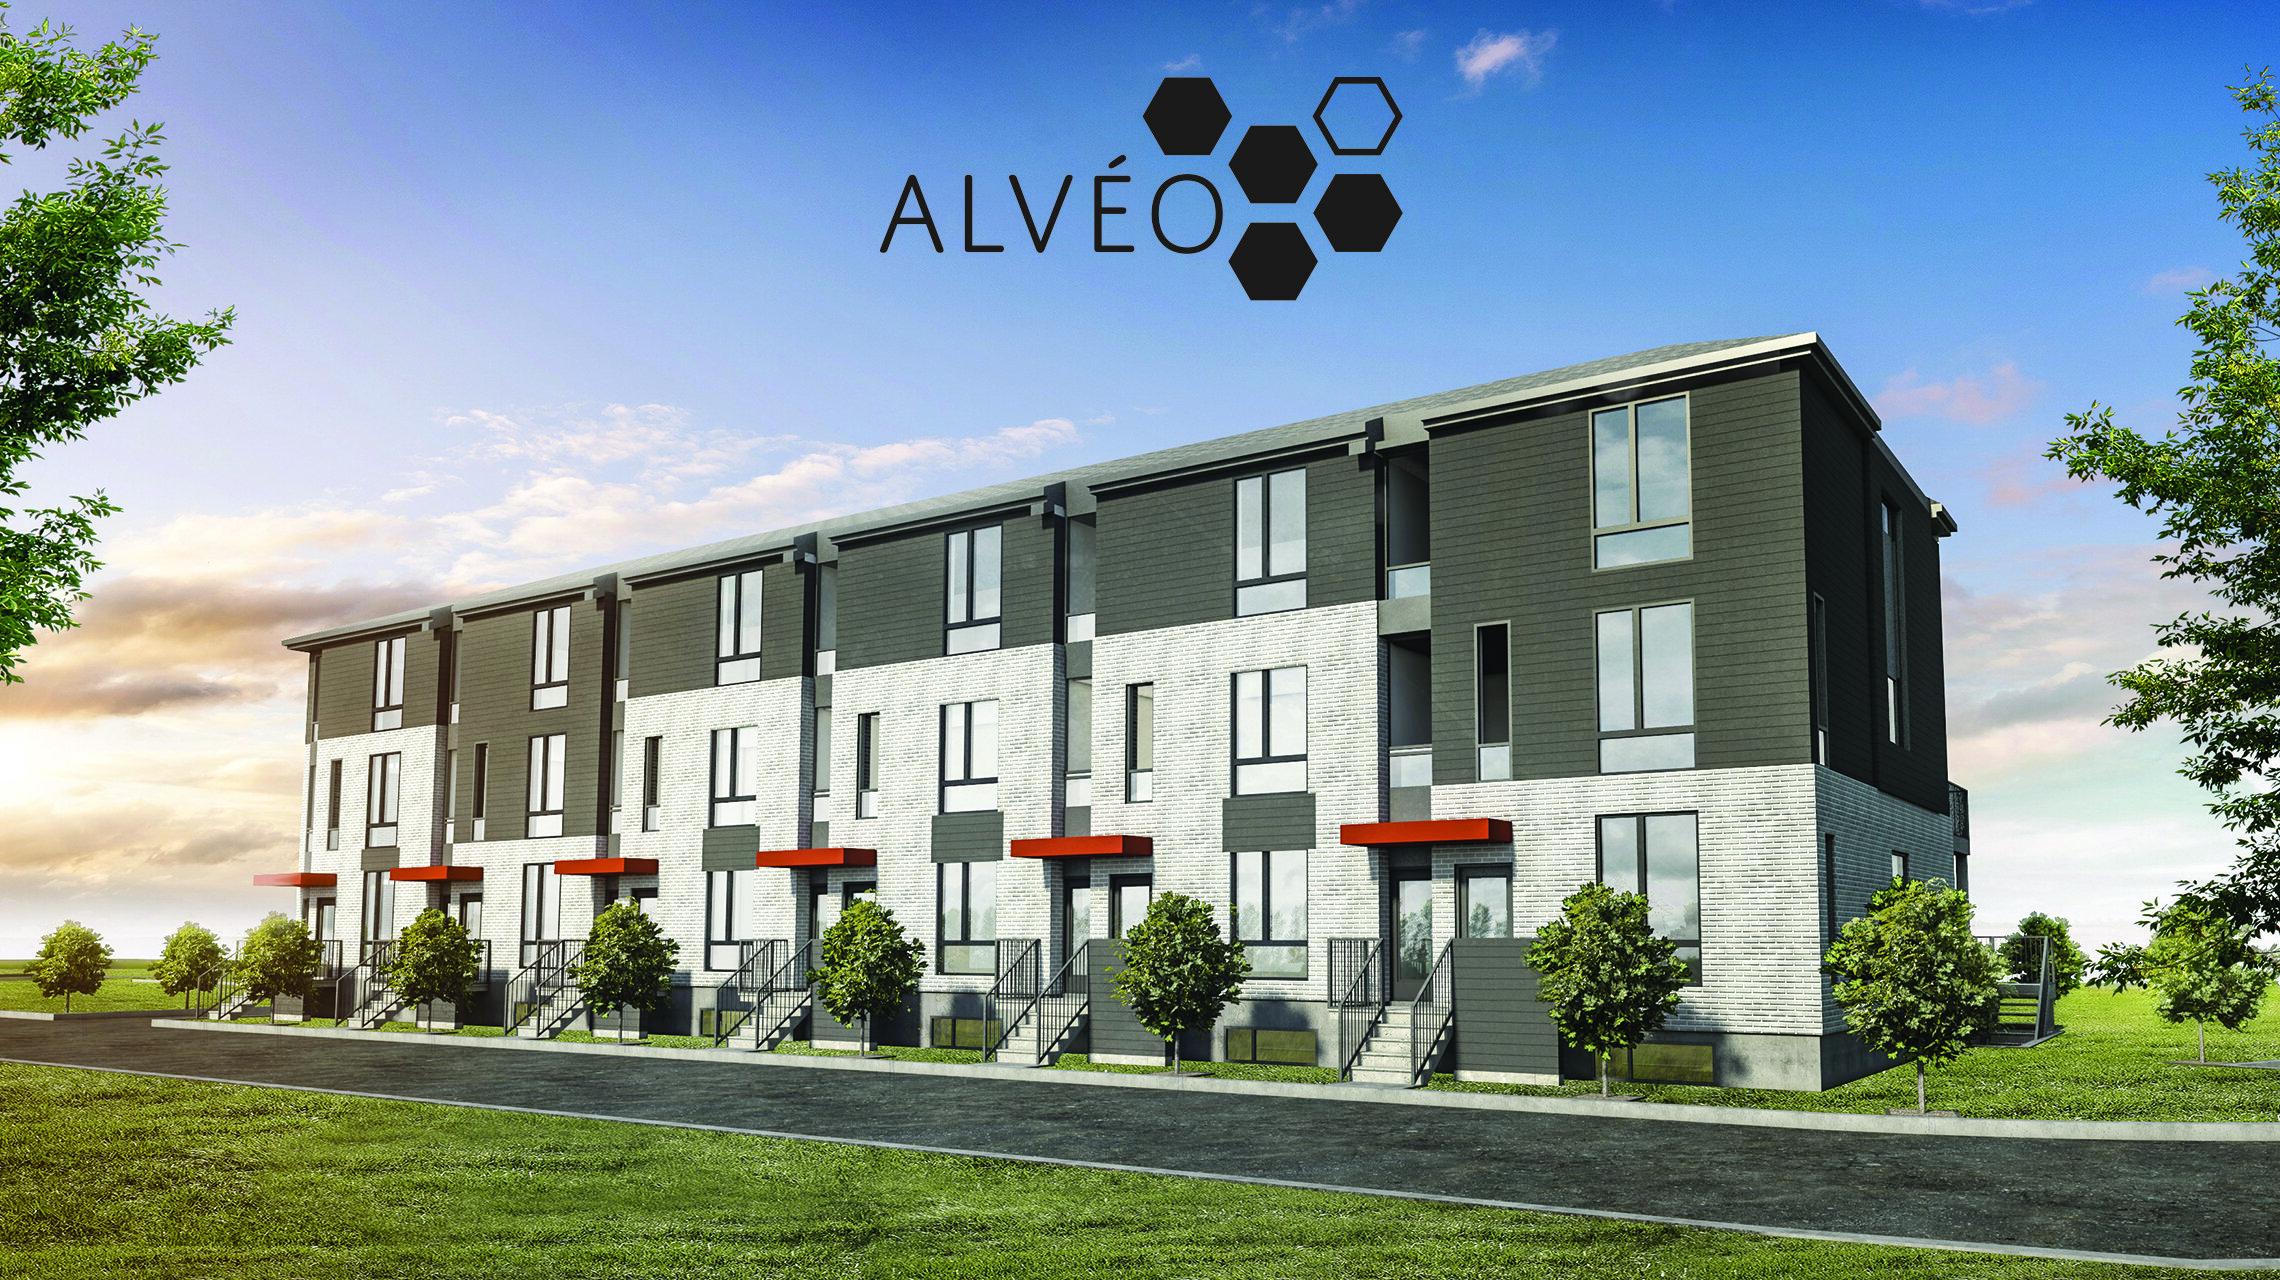 Immobilier laurentides Banner Alveo